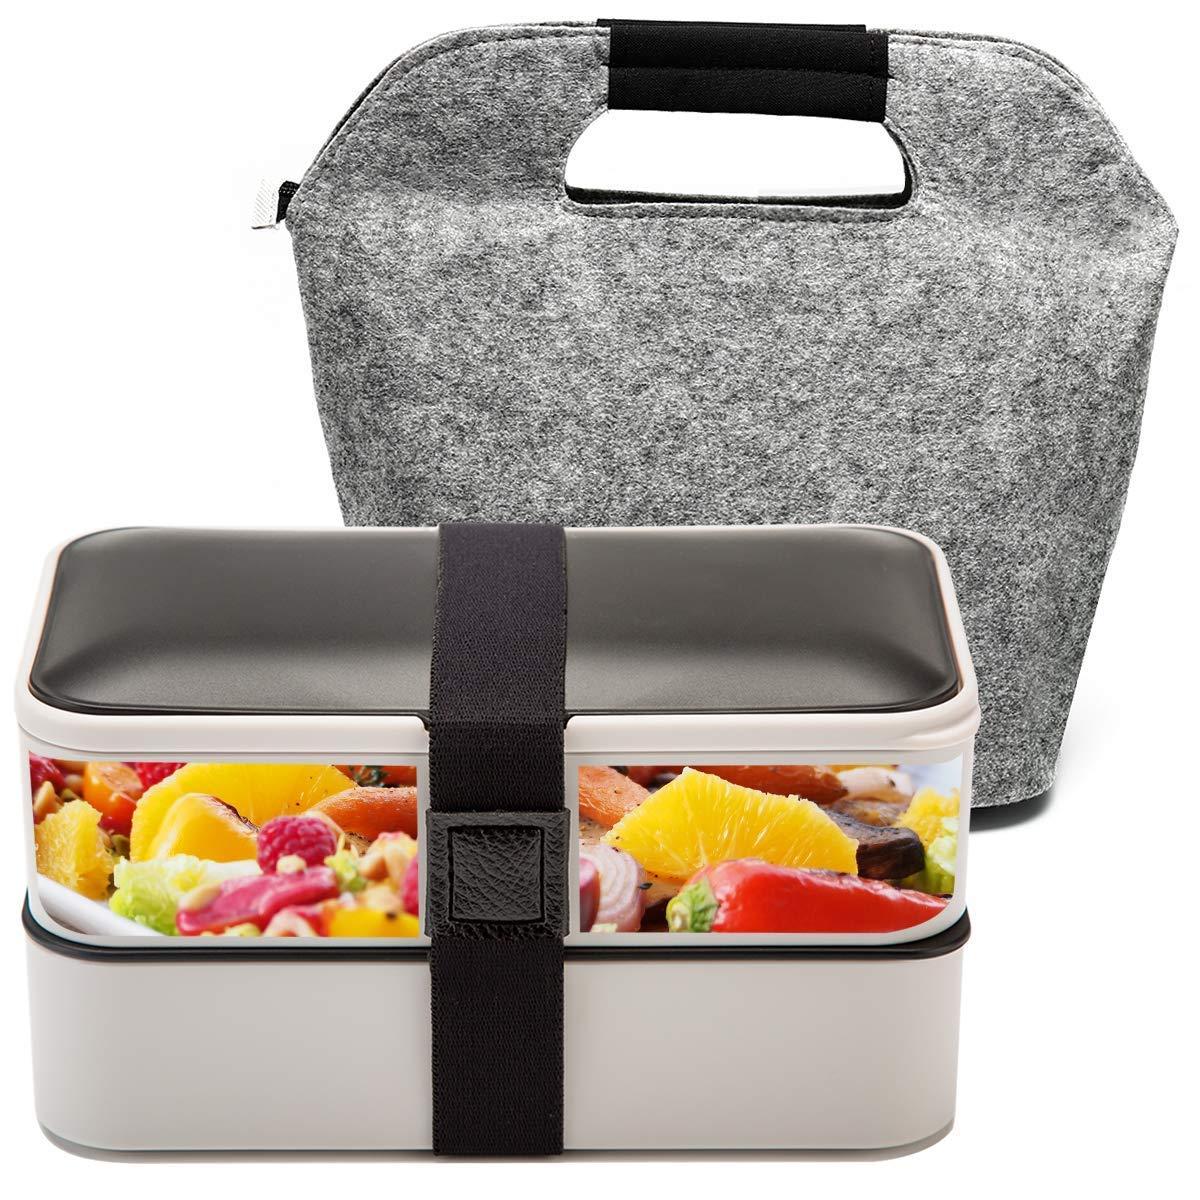 Lunch Box, BOQUN Bento Box